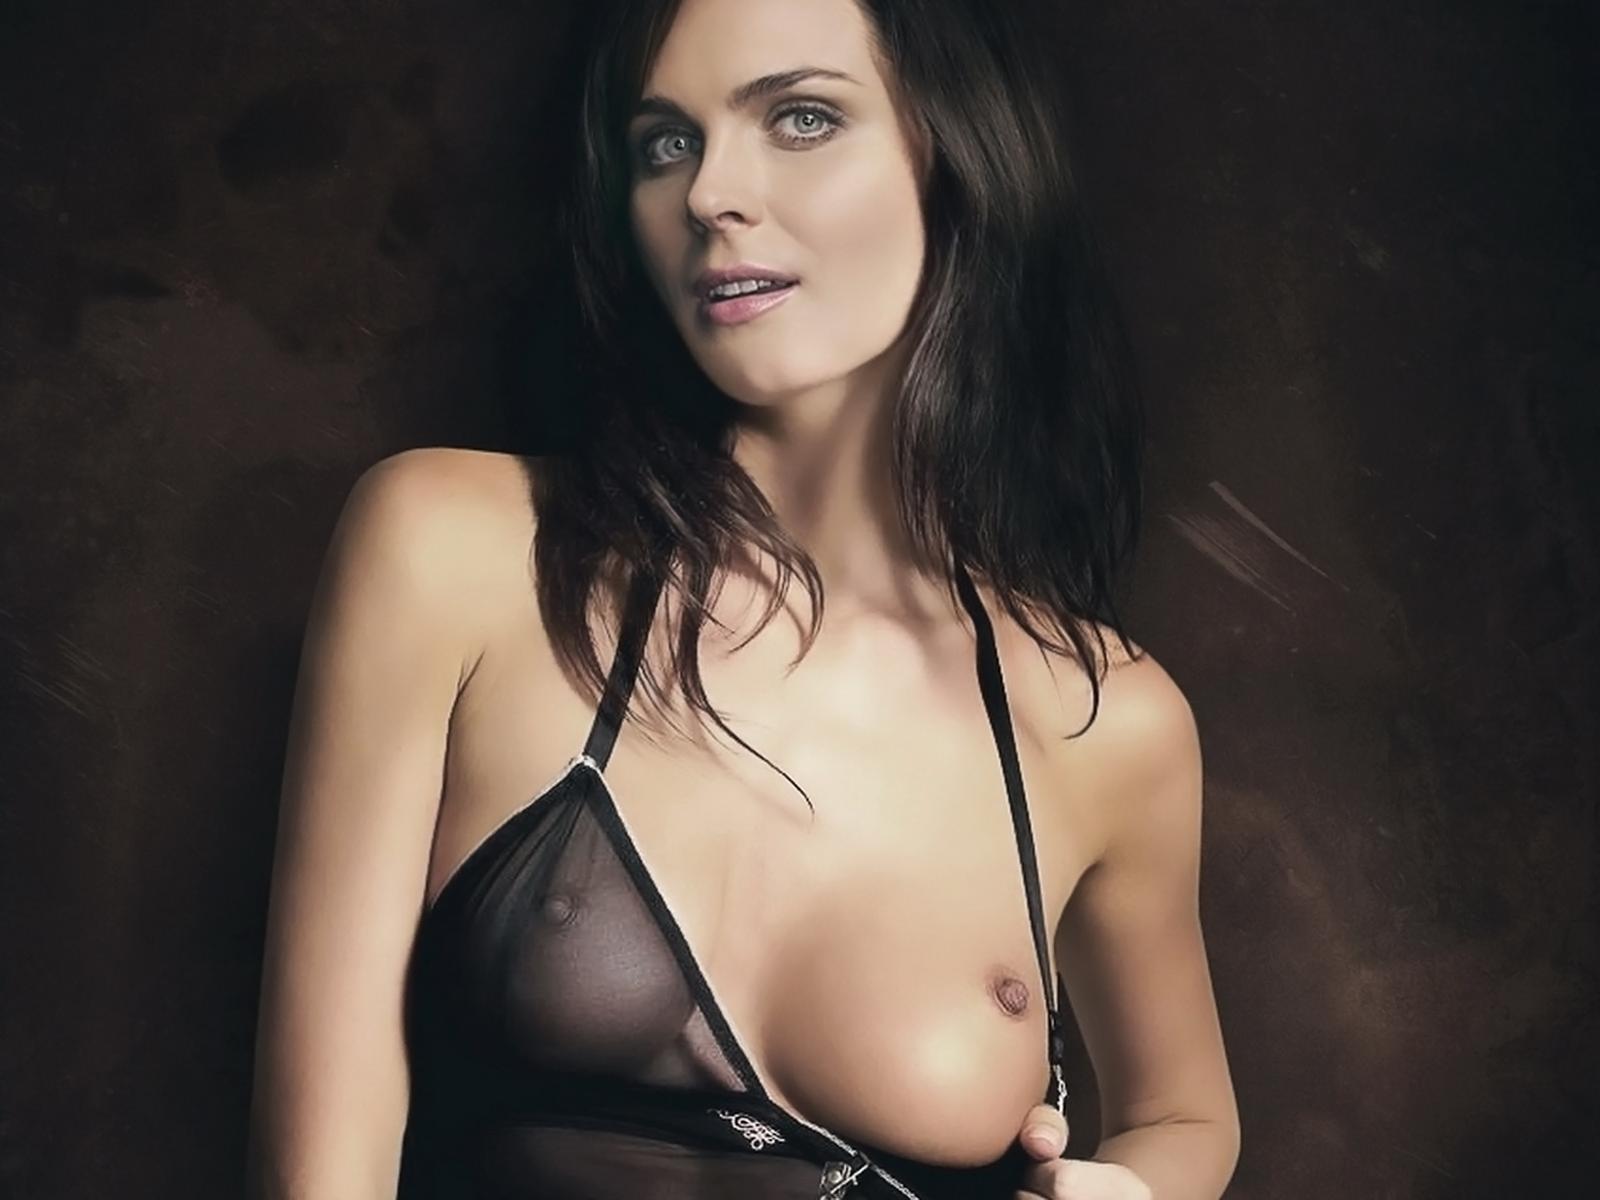 Emily symons free topless pics